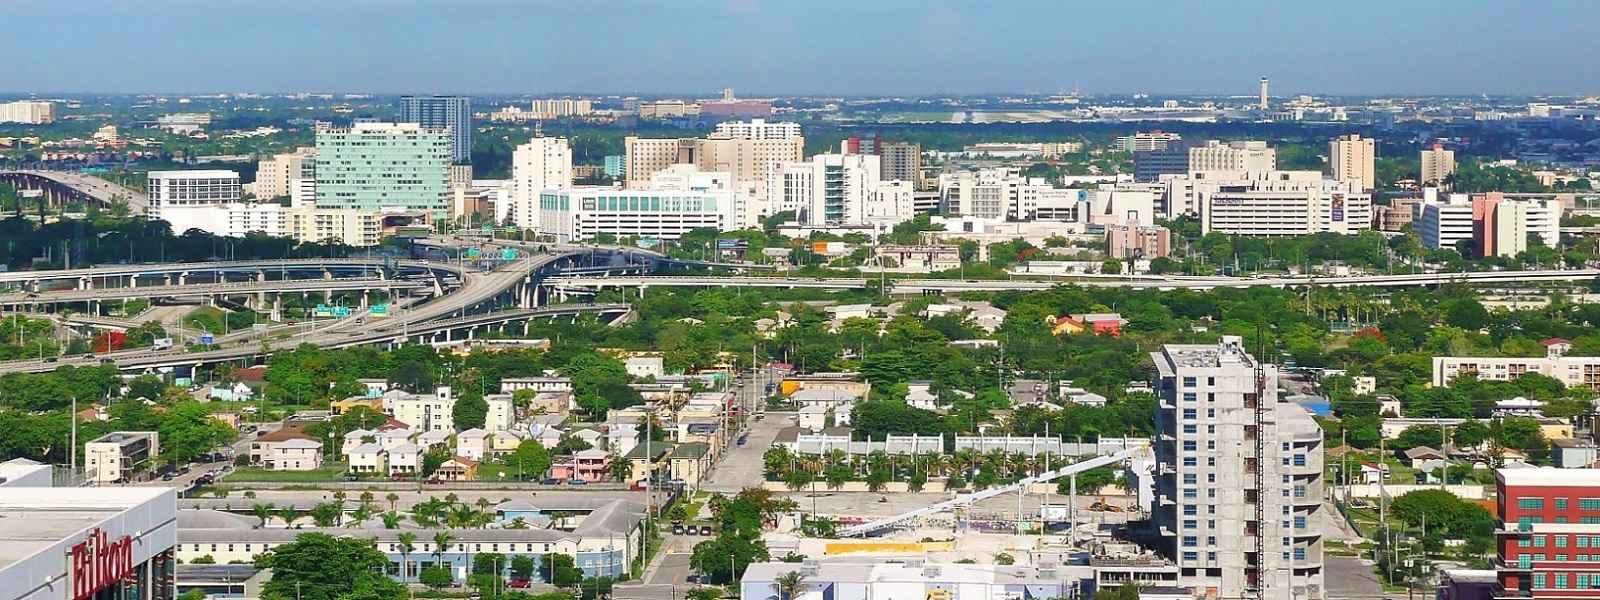 MiamiNeighborhoods